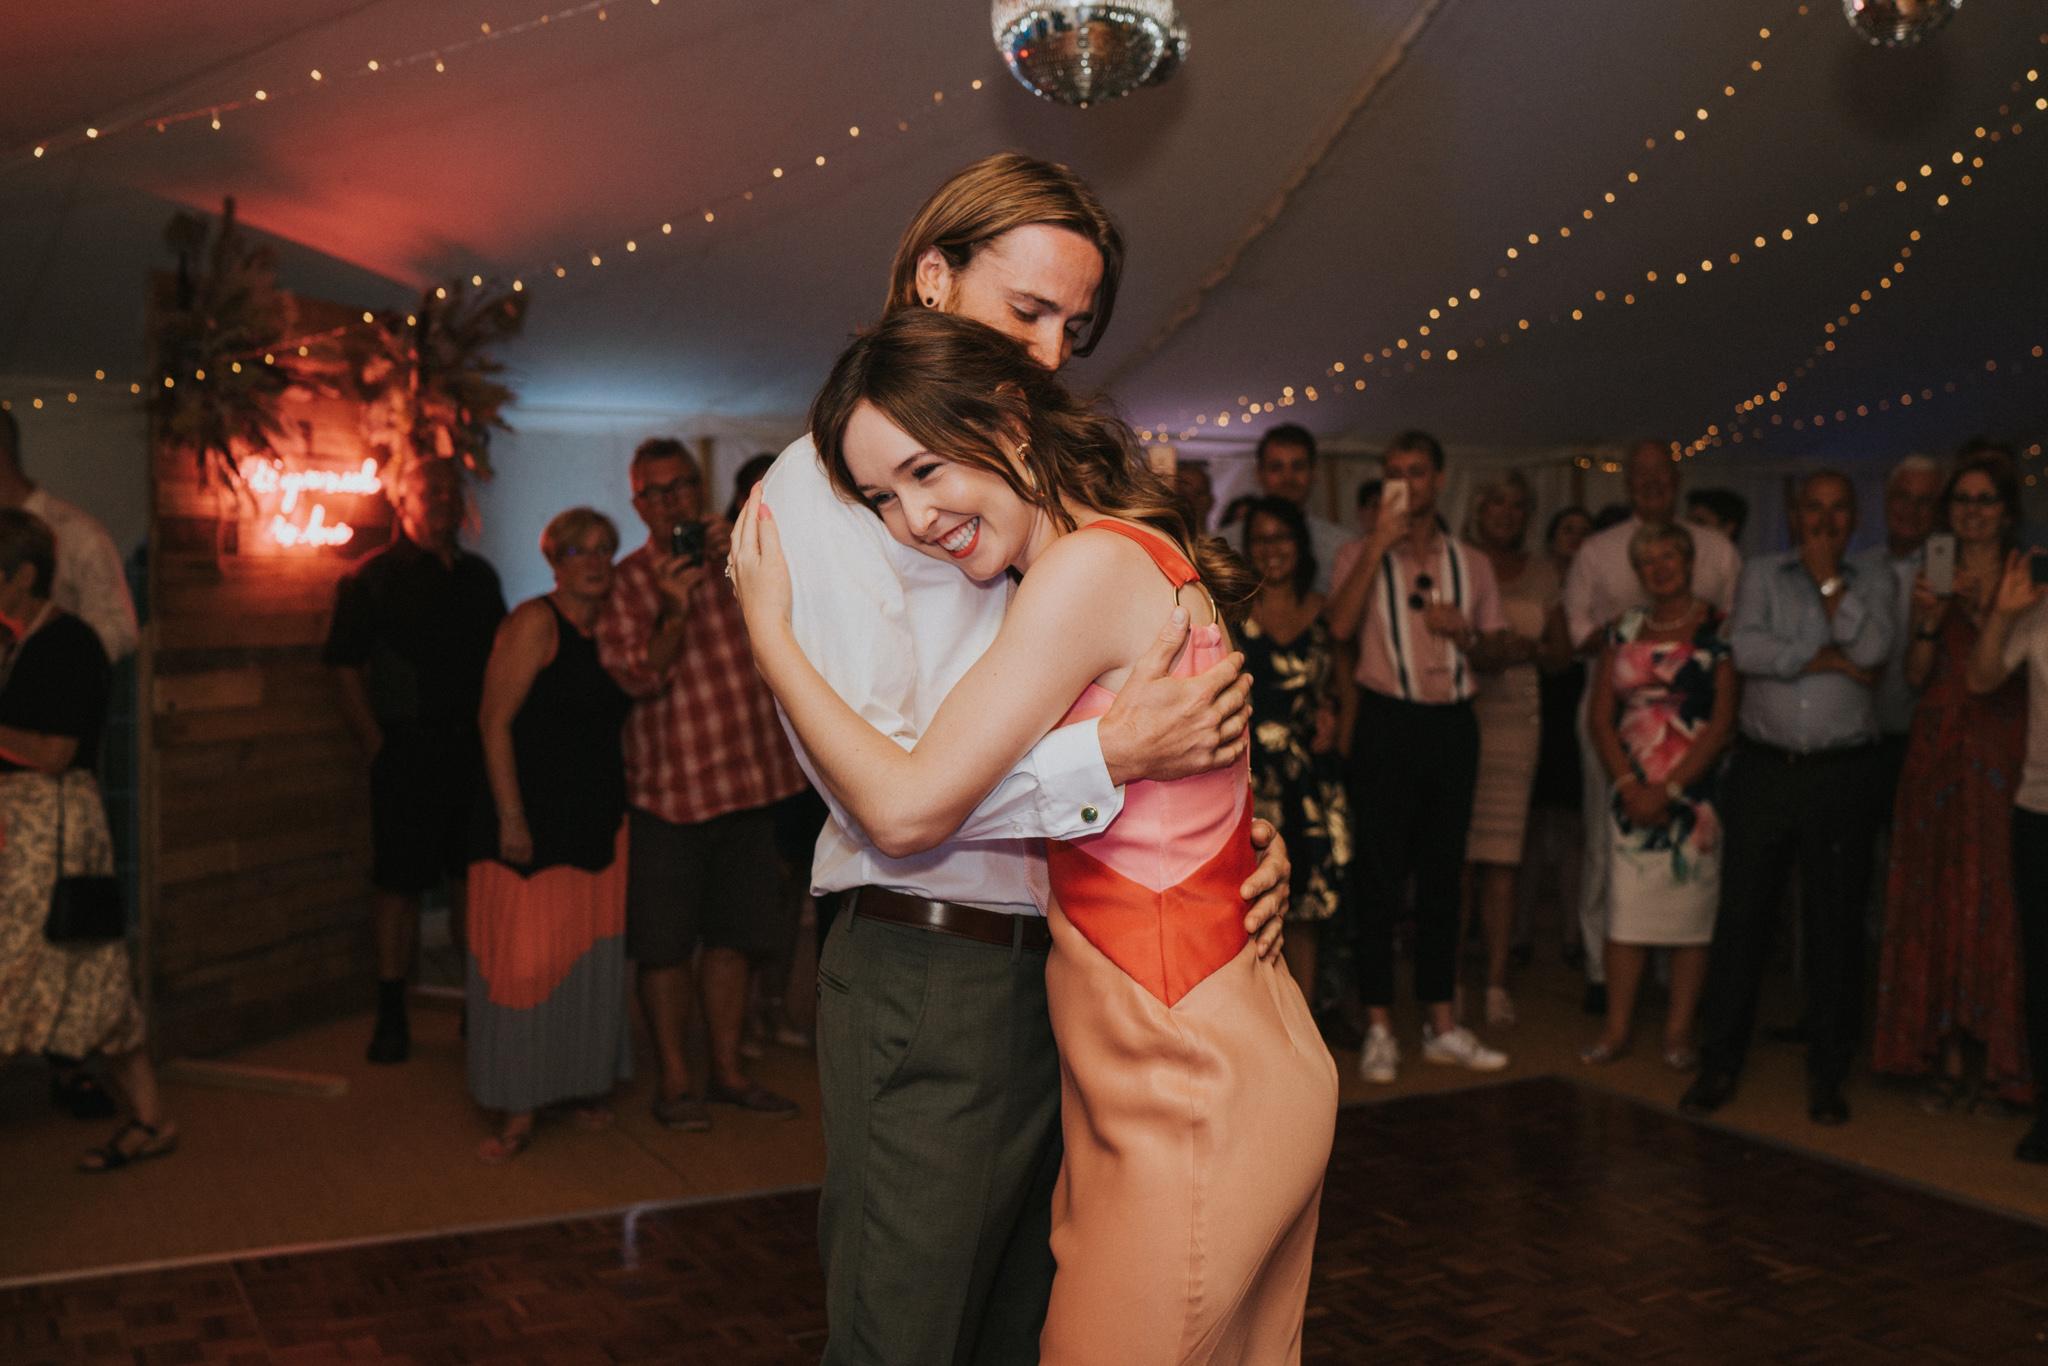 emi-Jack-boho-diy-wedding-eggington-house-grace-elizabeth-colchester-essex-alternative-wedding-photographer-suffolk-norfolk-devon (54 of 56).jpg